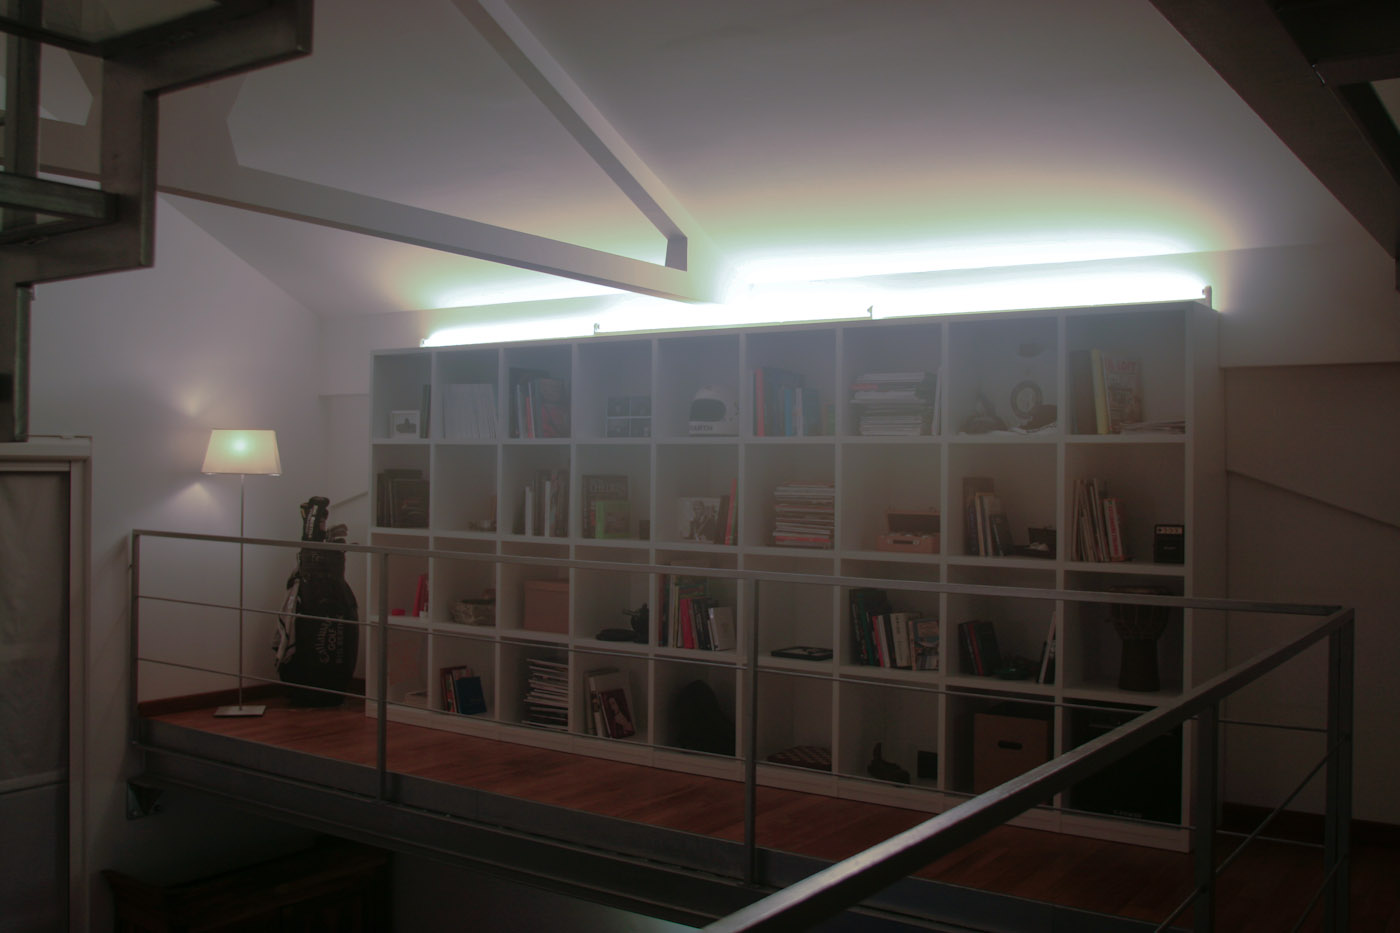 Radice arredamenti radice arredamenti libreria for 3 arredamenti